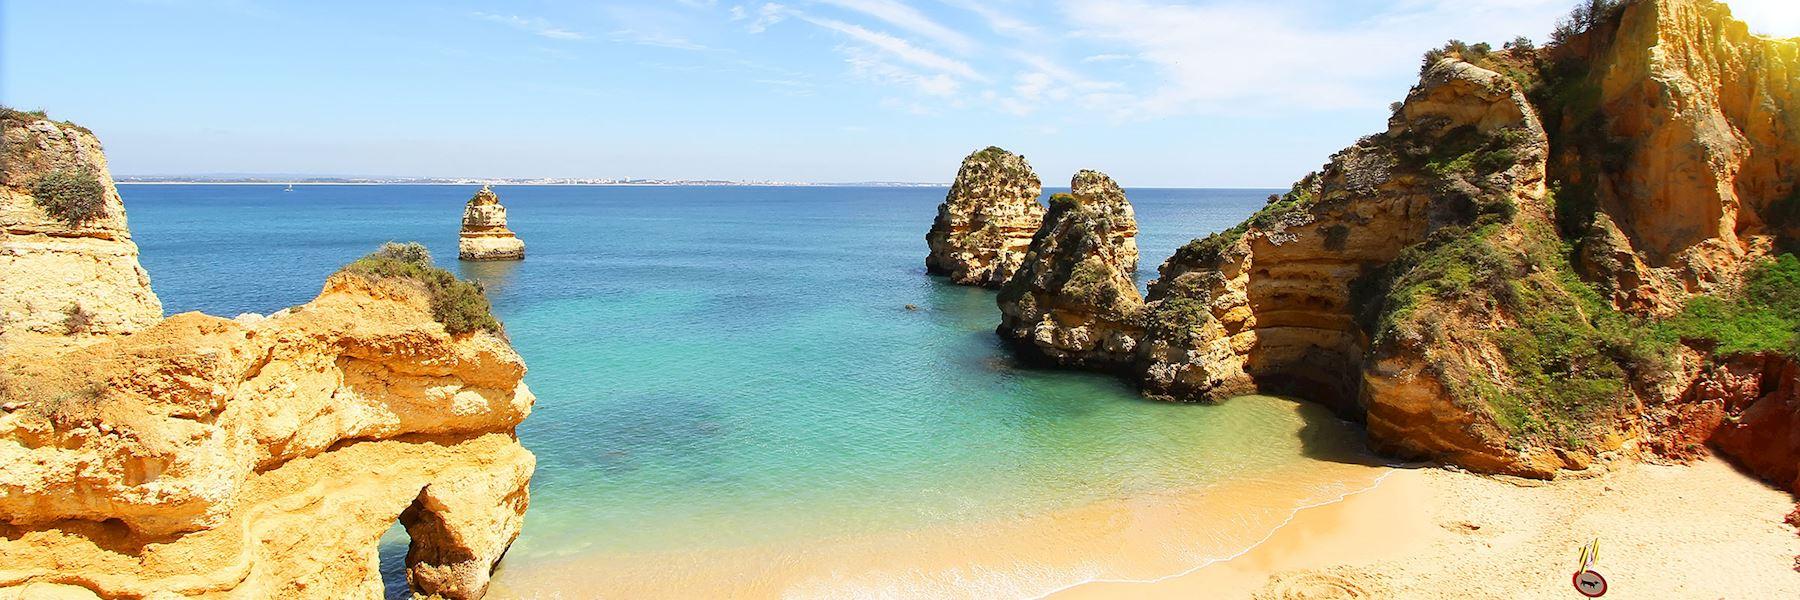 Portugal trip ideas